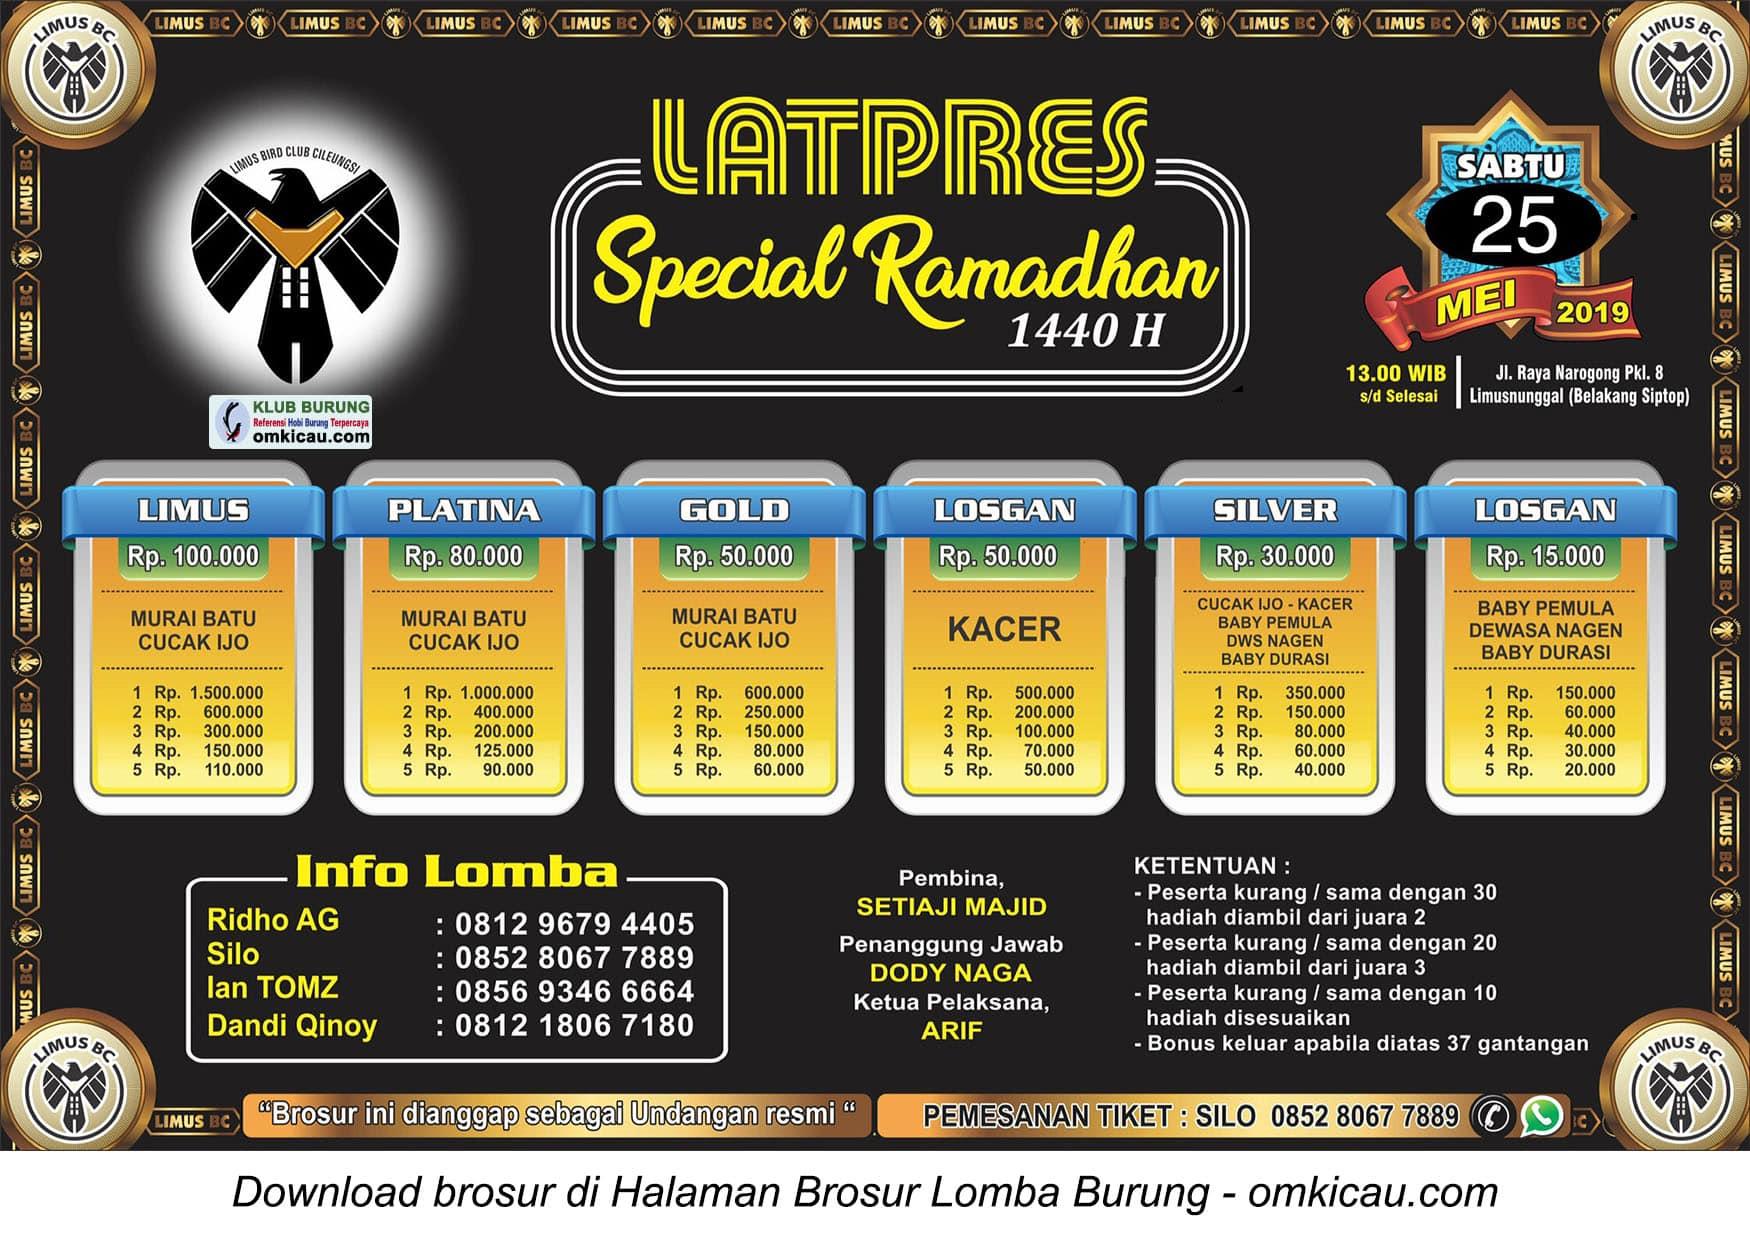 Latpres Special Ramadhan Limus BC